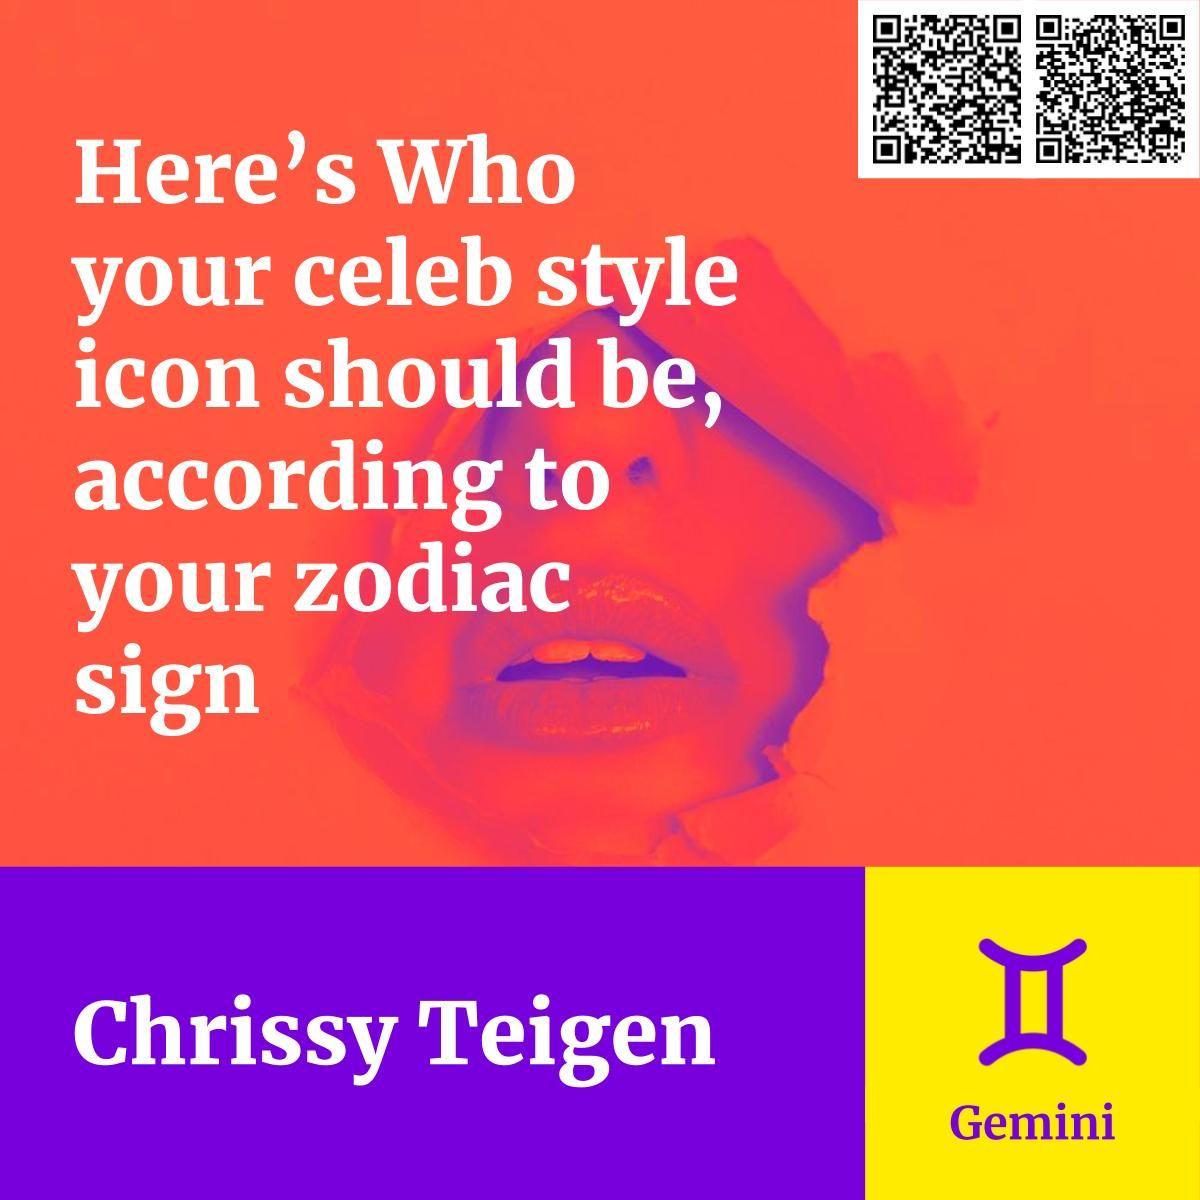 libra daily celebrity horoscope